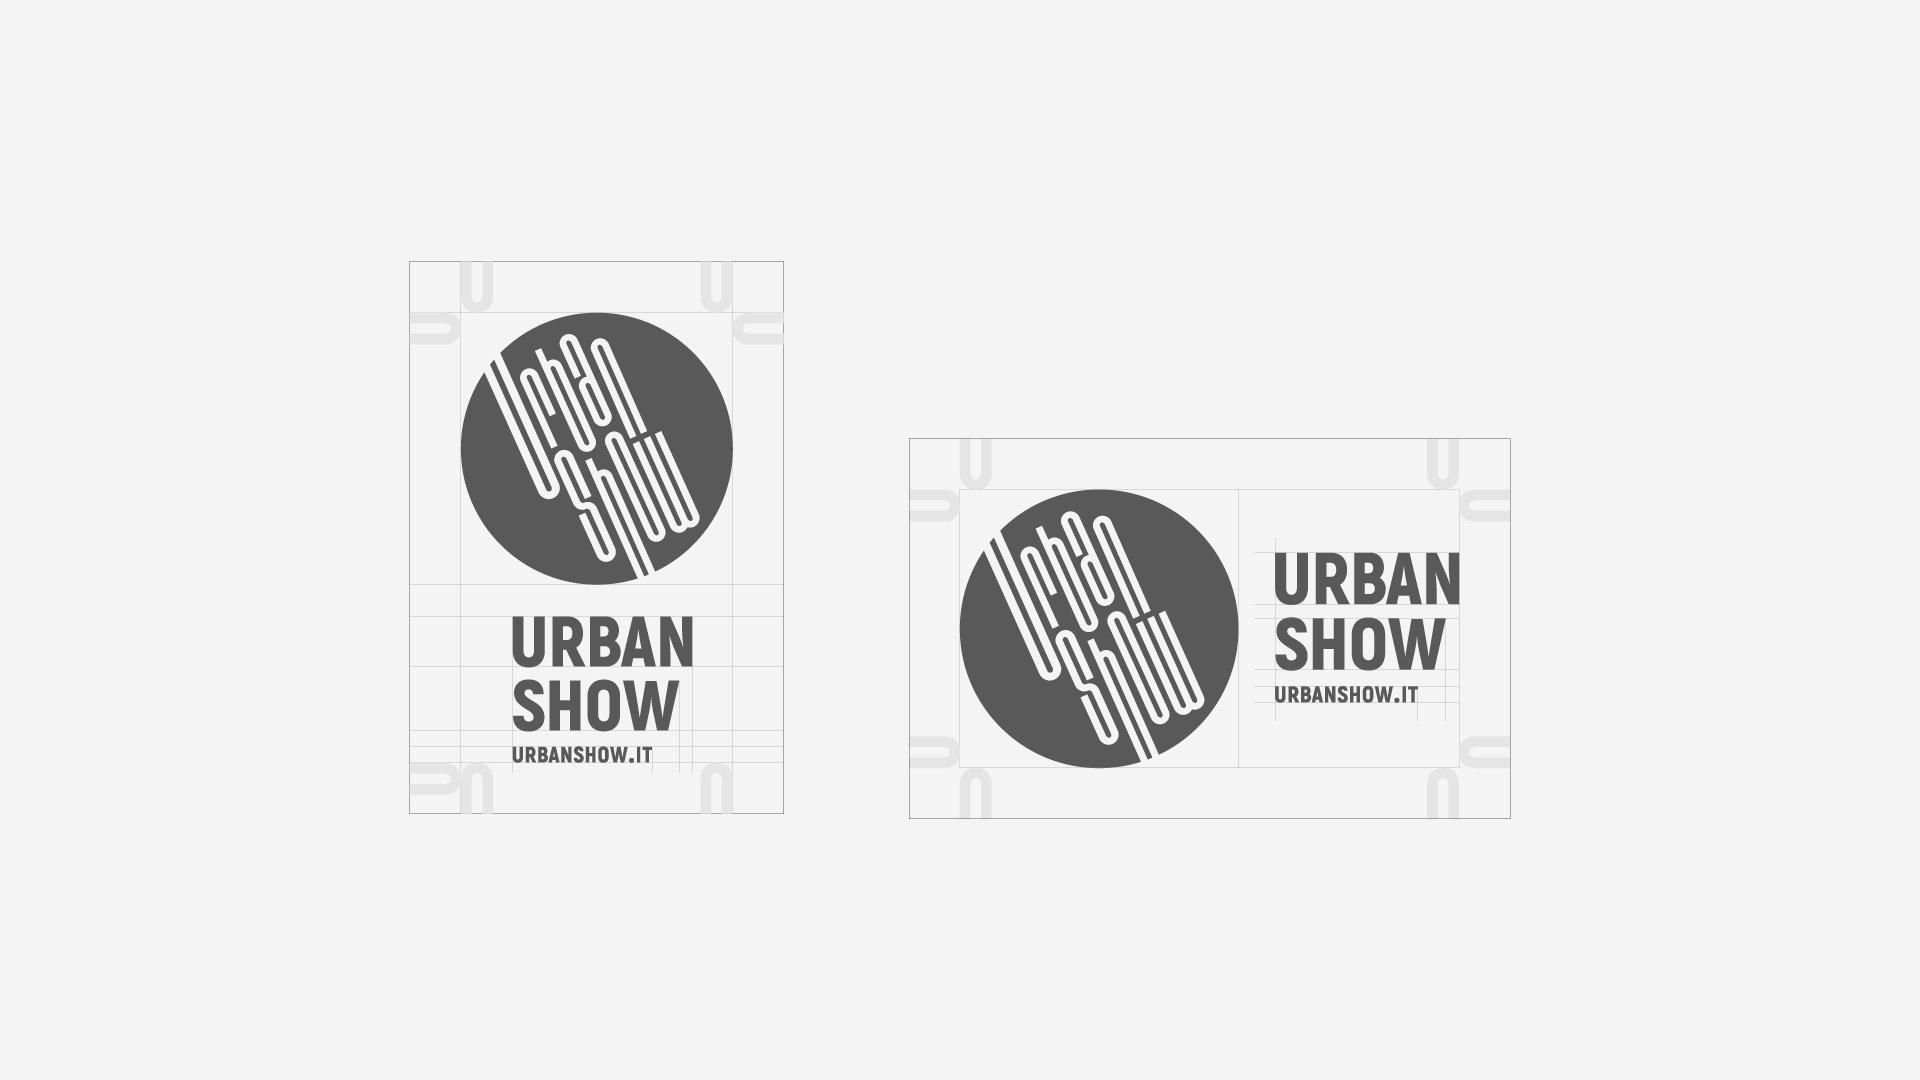 Urban show